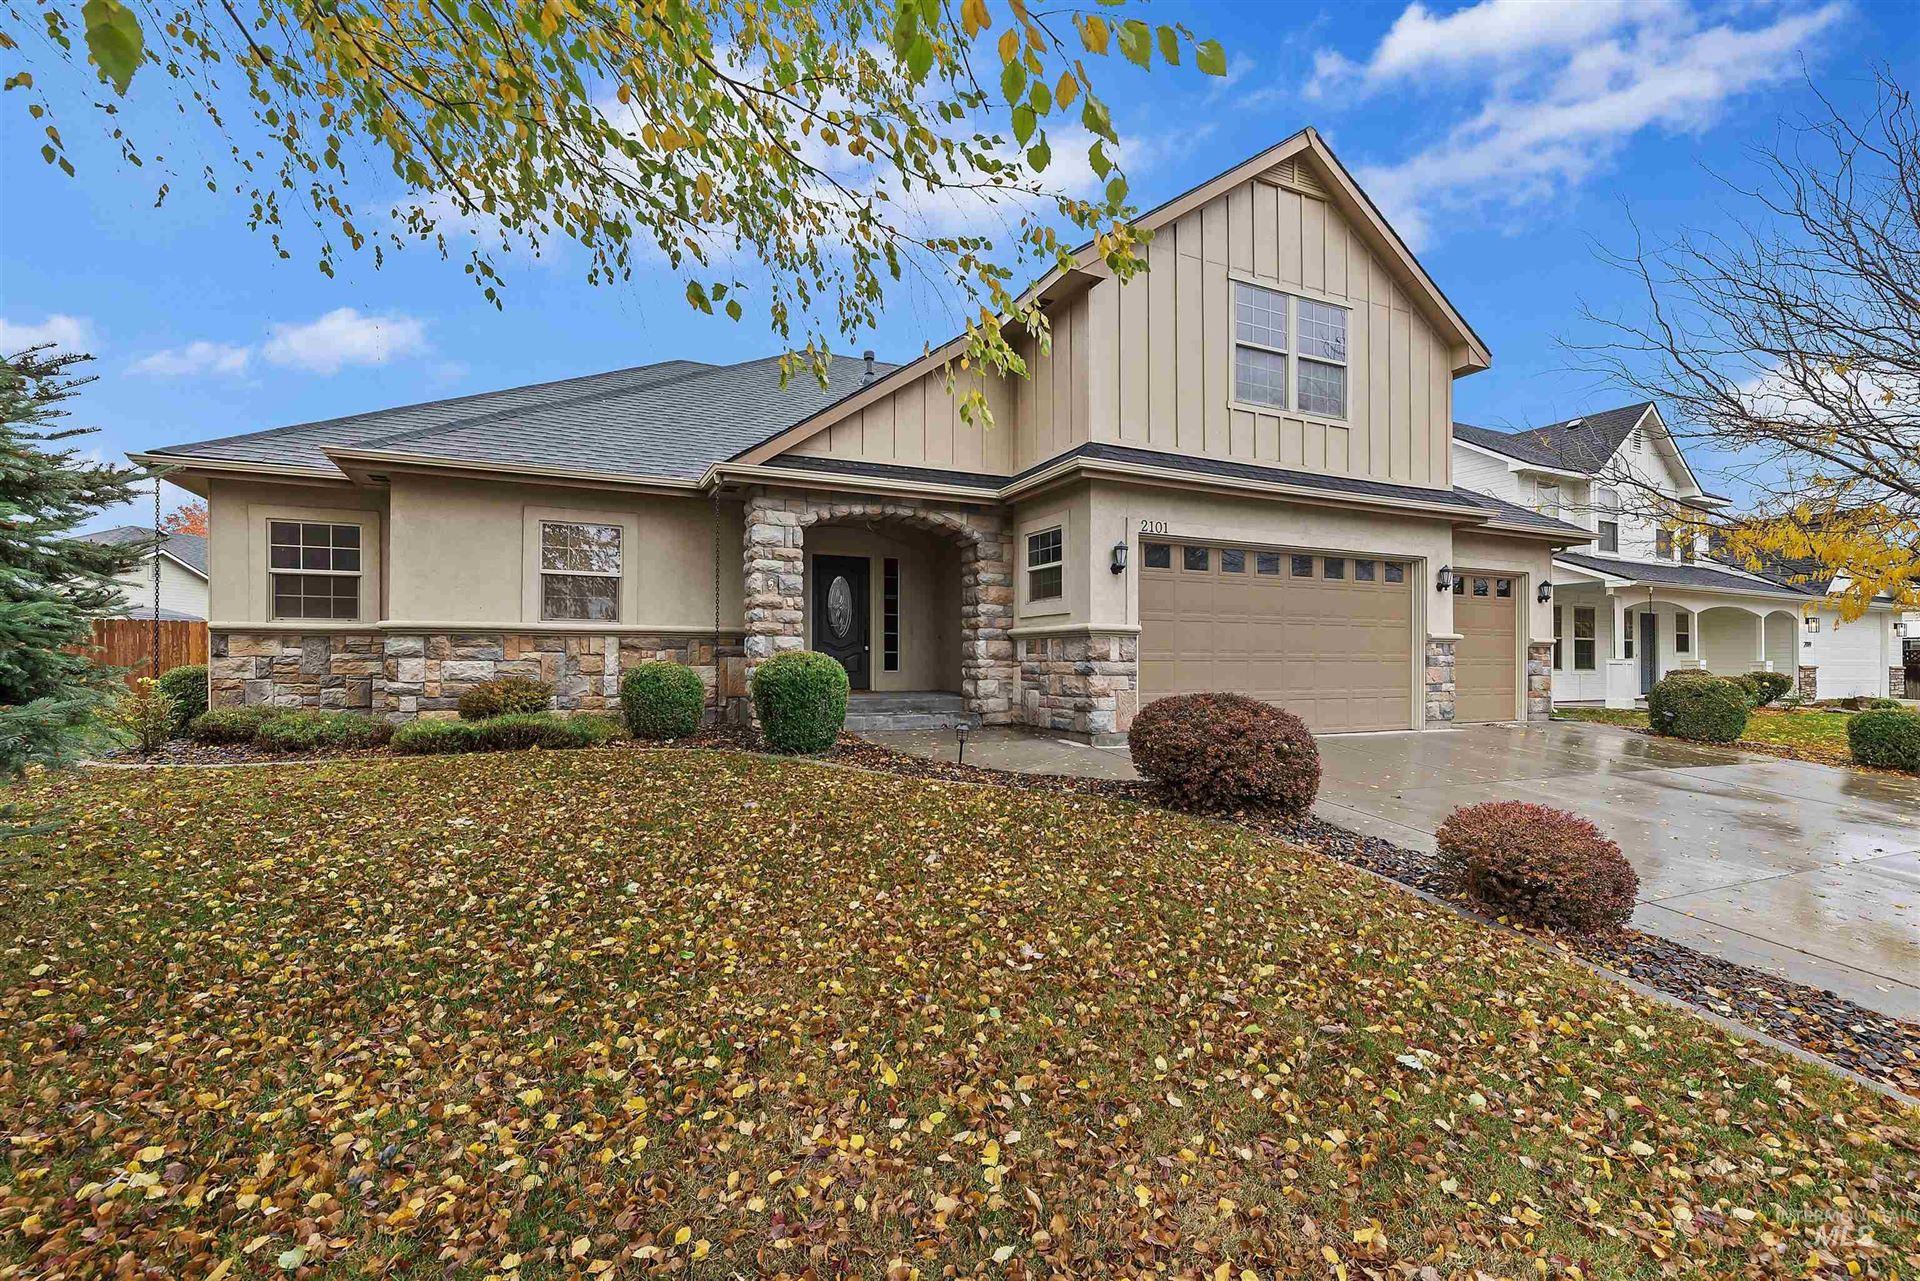 Photo of 2101 S Canonero St., Boise, ID 83709 (MLS # 98823519)